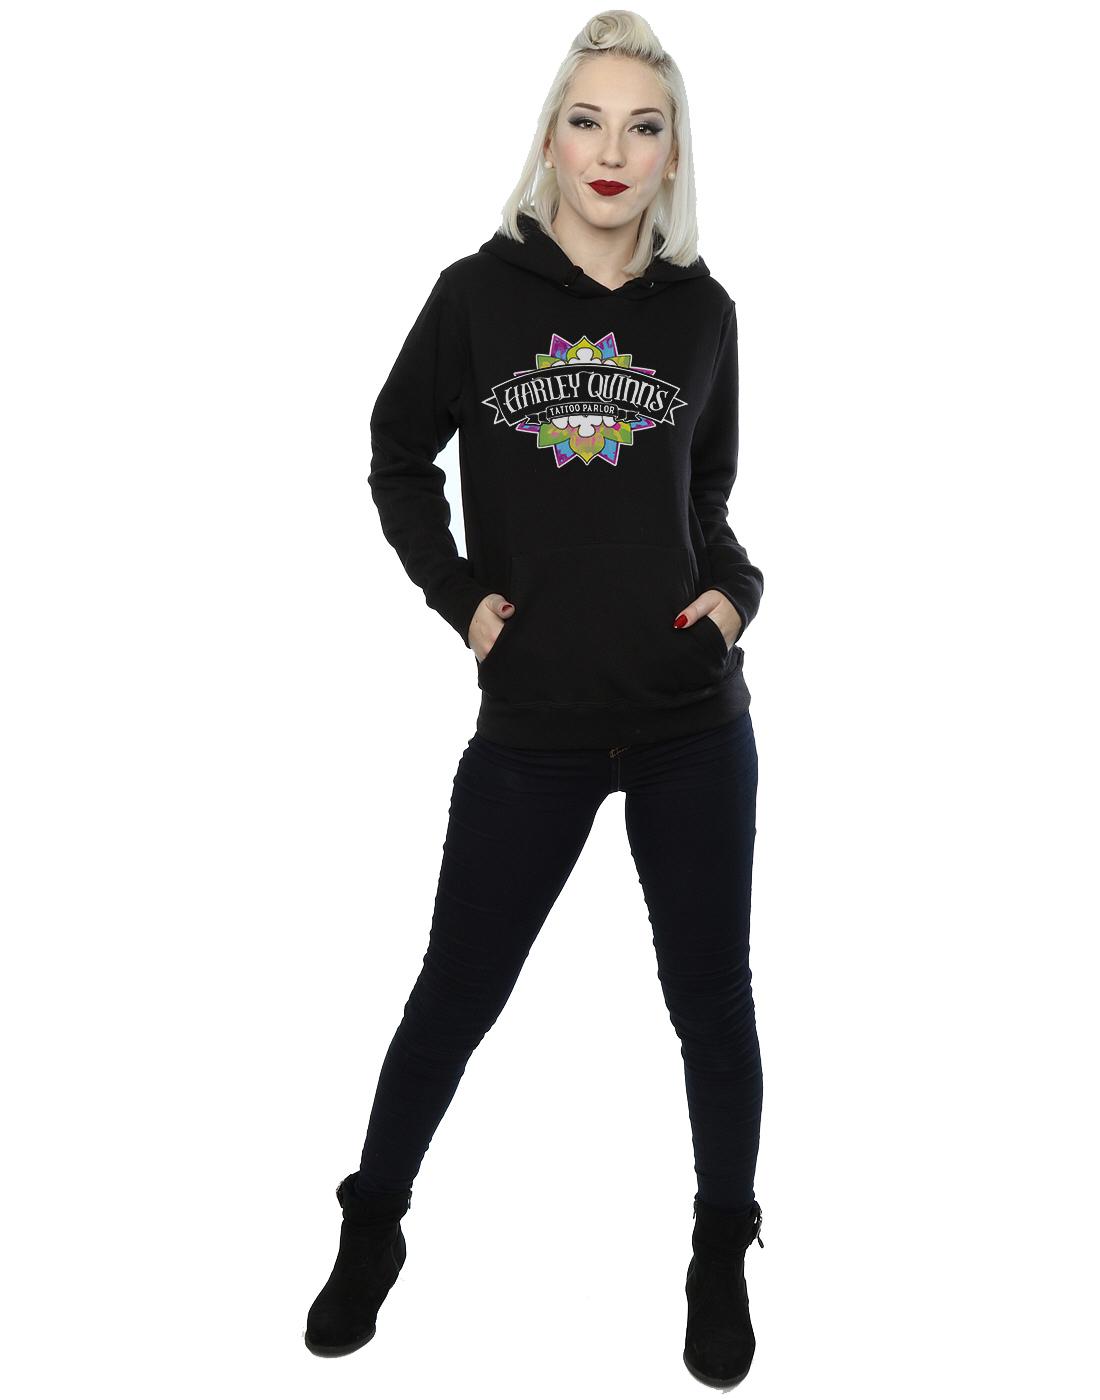 Suicide Harley Felpa Squad Tattoo Quinn Parlour Donna Cappuccio Con EwxEq6RrWO